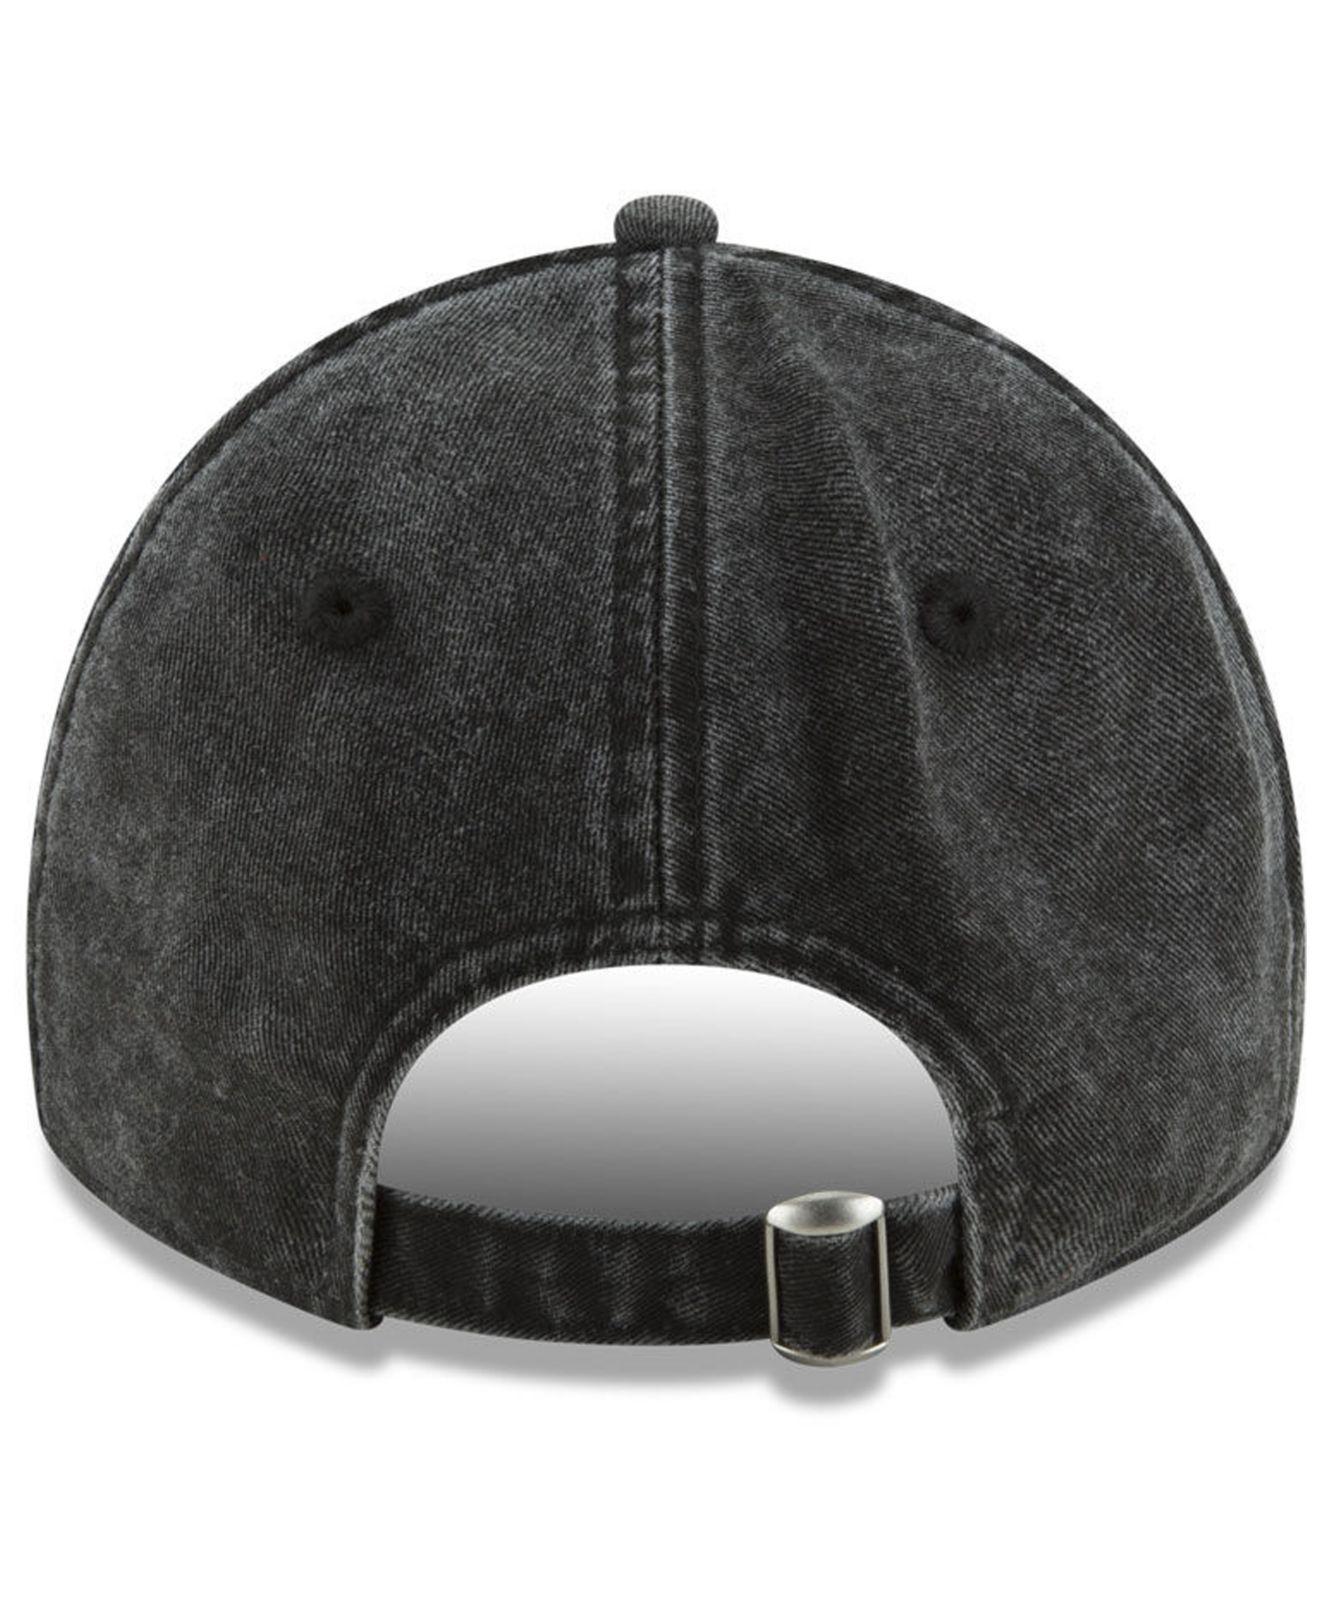 best service 12b64 82d89 ... adjustable hat f3d4e 90075  shopping lyst ktz italian wash 9twenty cap  in black for men fe3a8 70eea